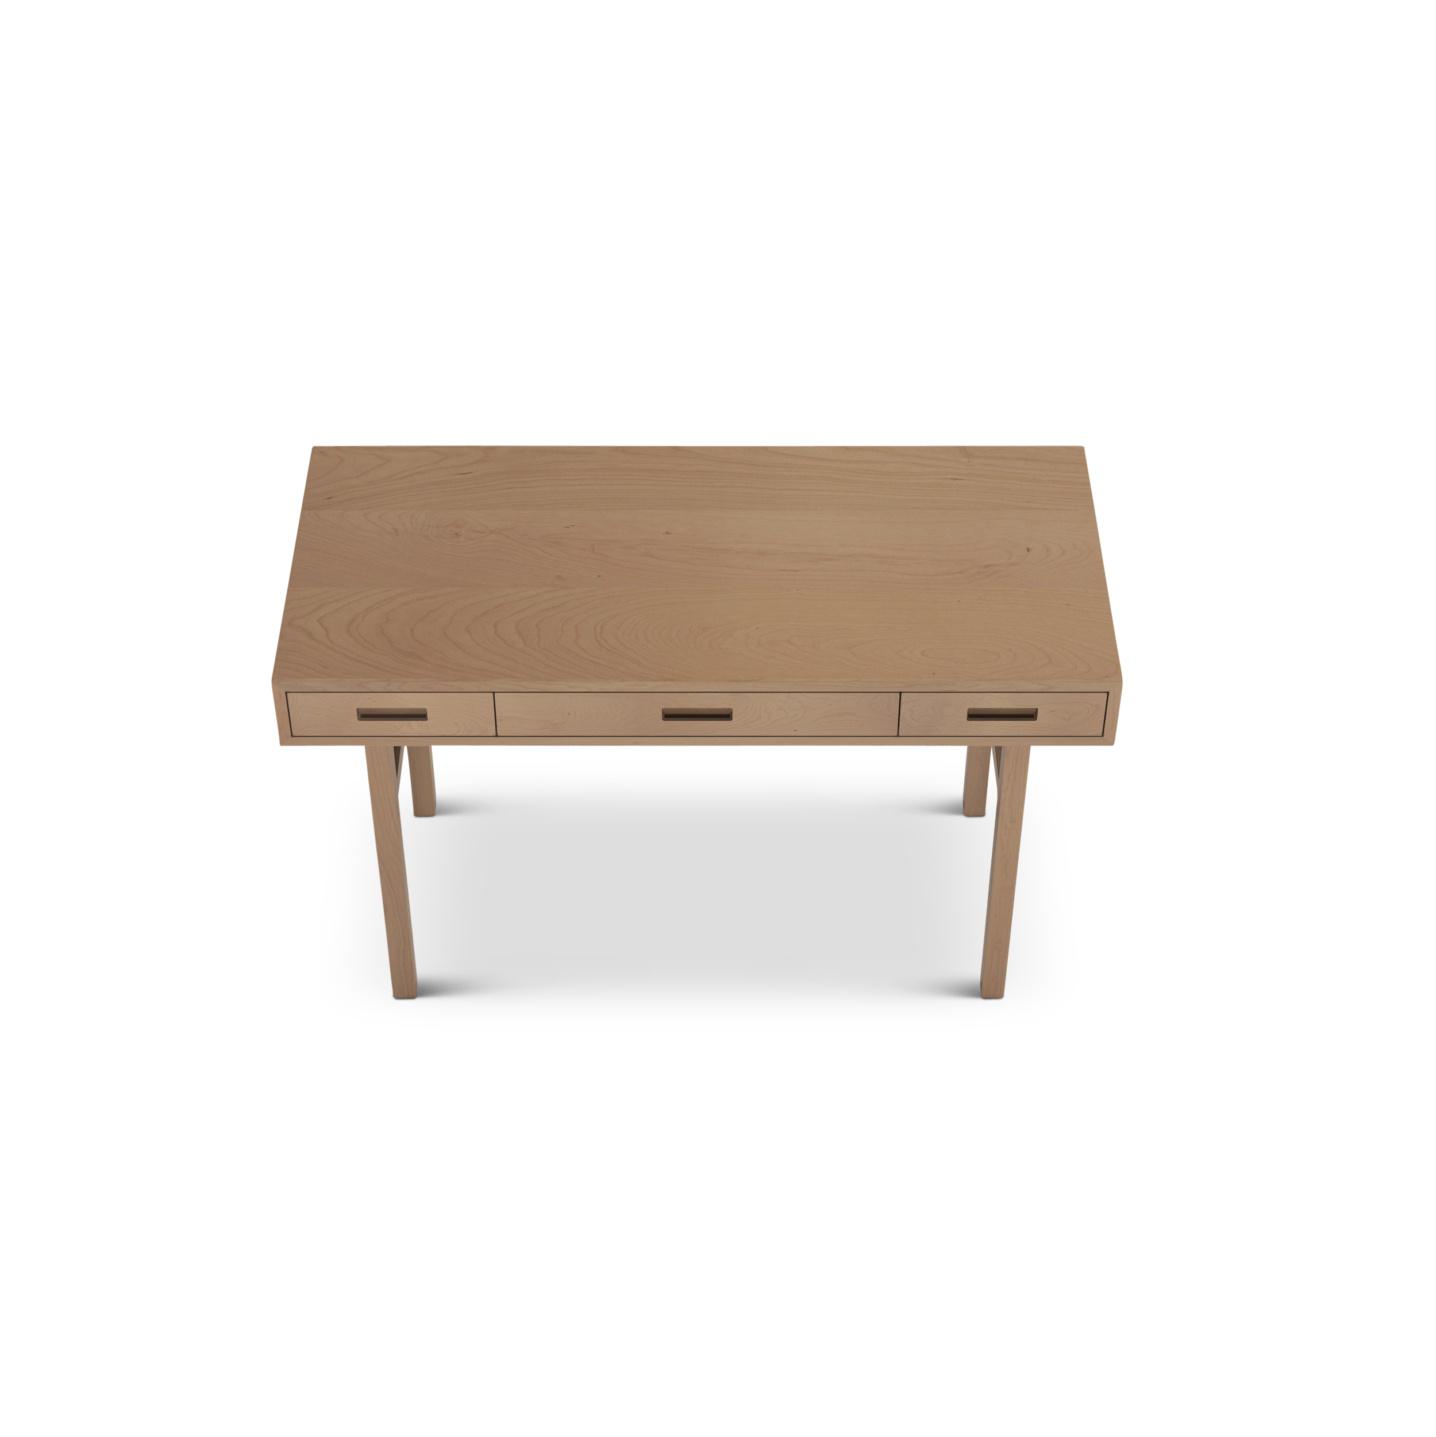 Custom Cherry wood desk